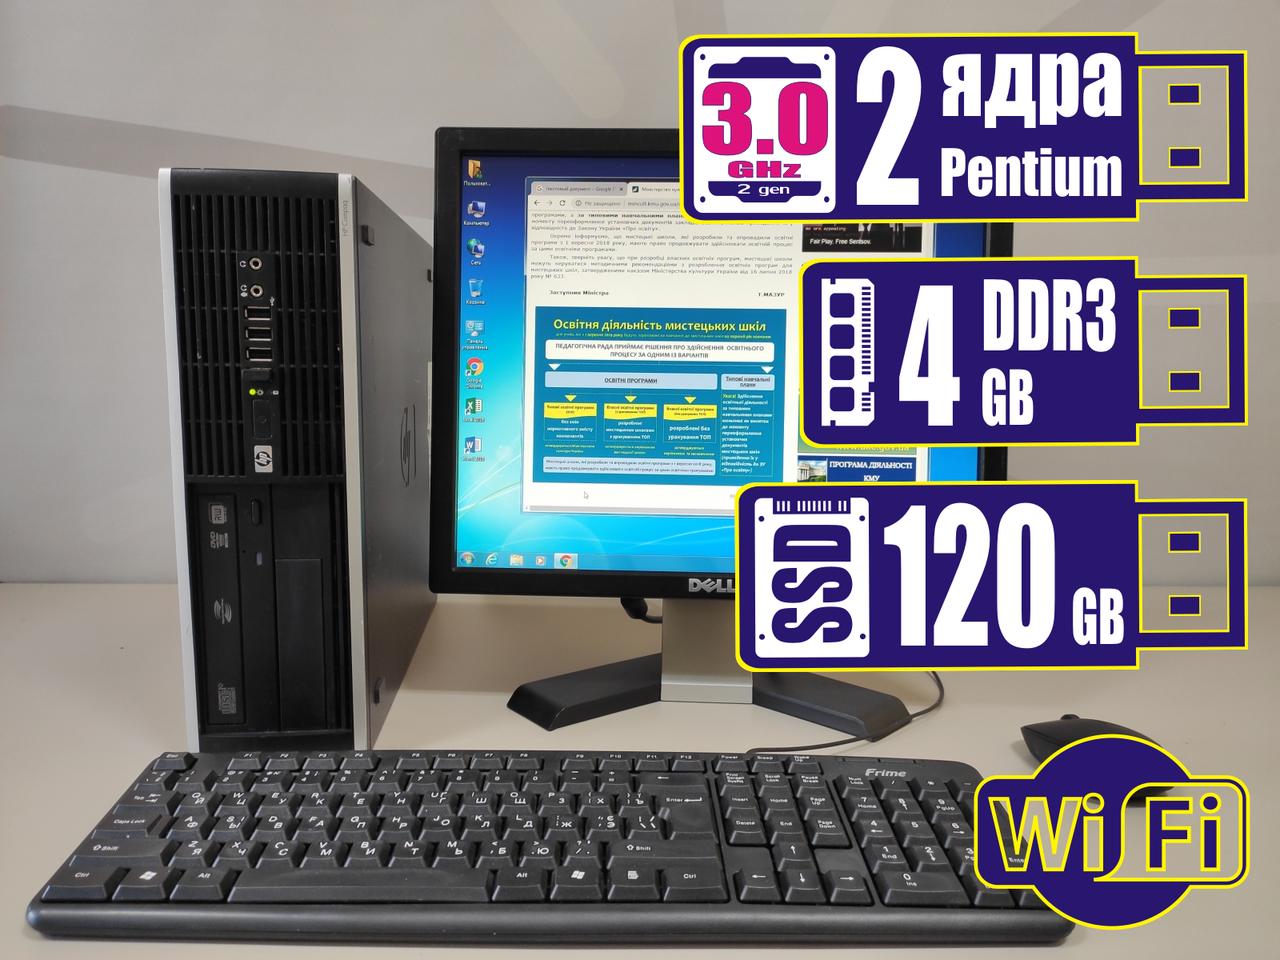 Системный блок компьютер ПК HP Pentium/4Gb DDR3/120GB SSD +Bonus WiFi